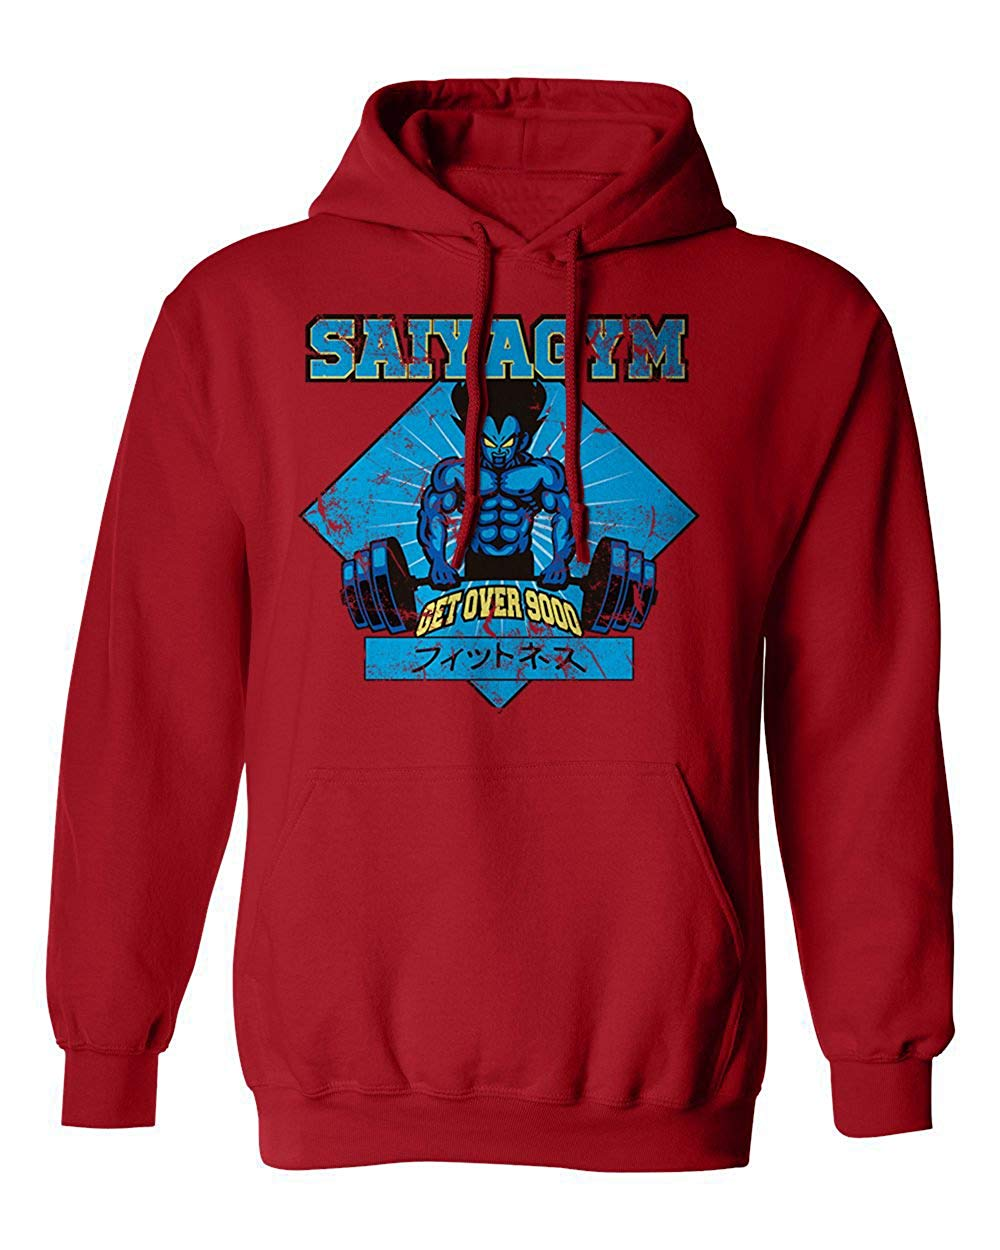 New Graphic Shirt Saiya Gym Novelty Tee Dragon Men's Hoodie Hooded Sweatshirt Men Women Hoodie Sweatshirt